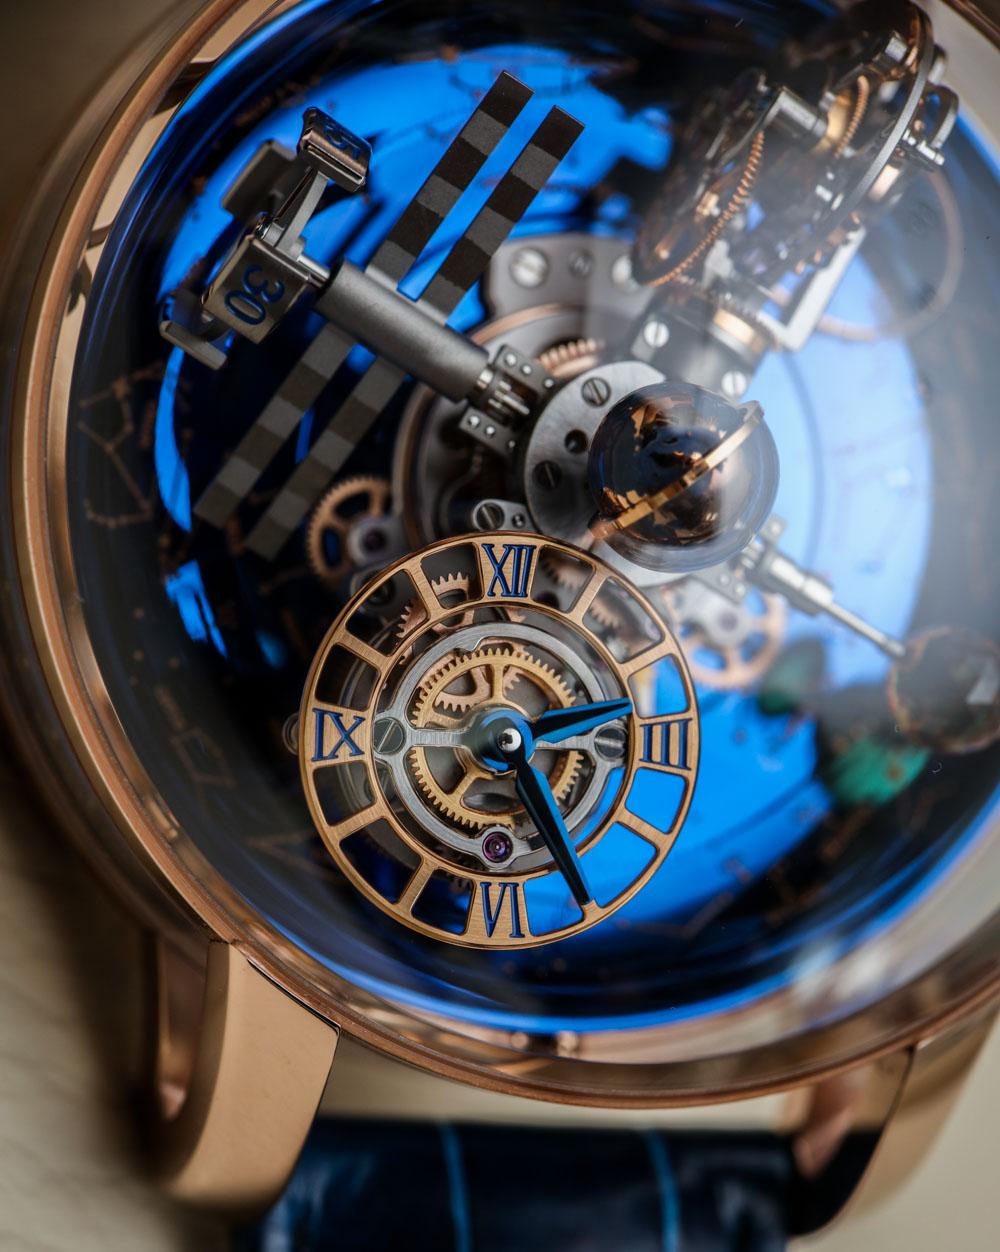 Jacob-Co-Astronomia-Sky-Celestial-Panorama-Gravitational-Triple-Axis-Tourbillon-Watch-